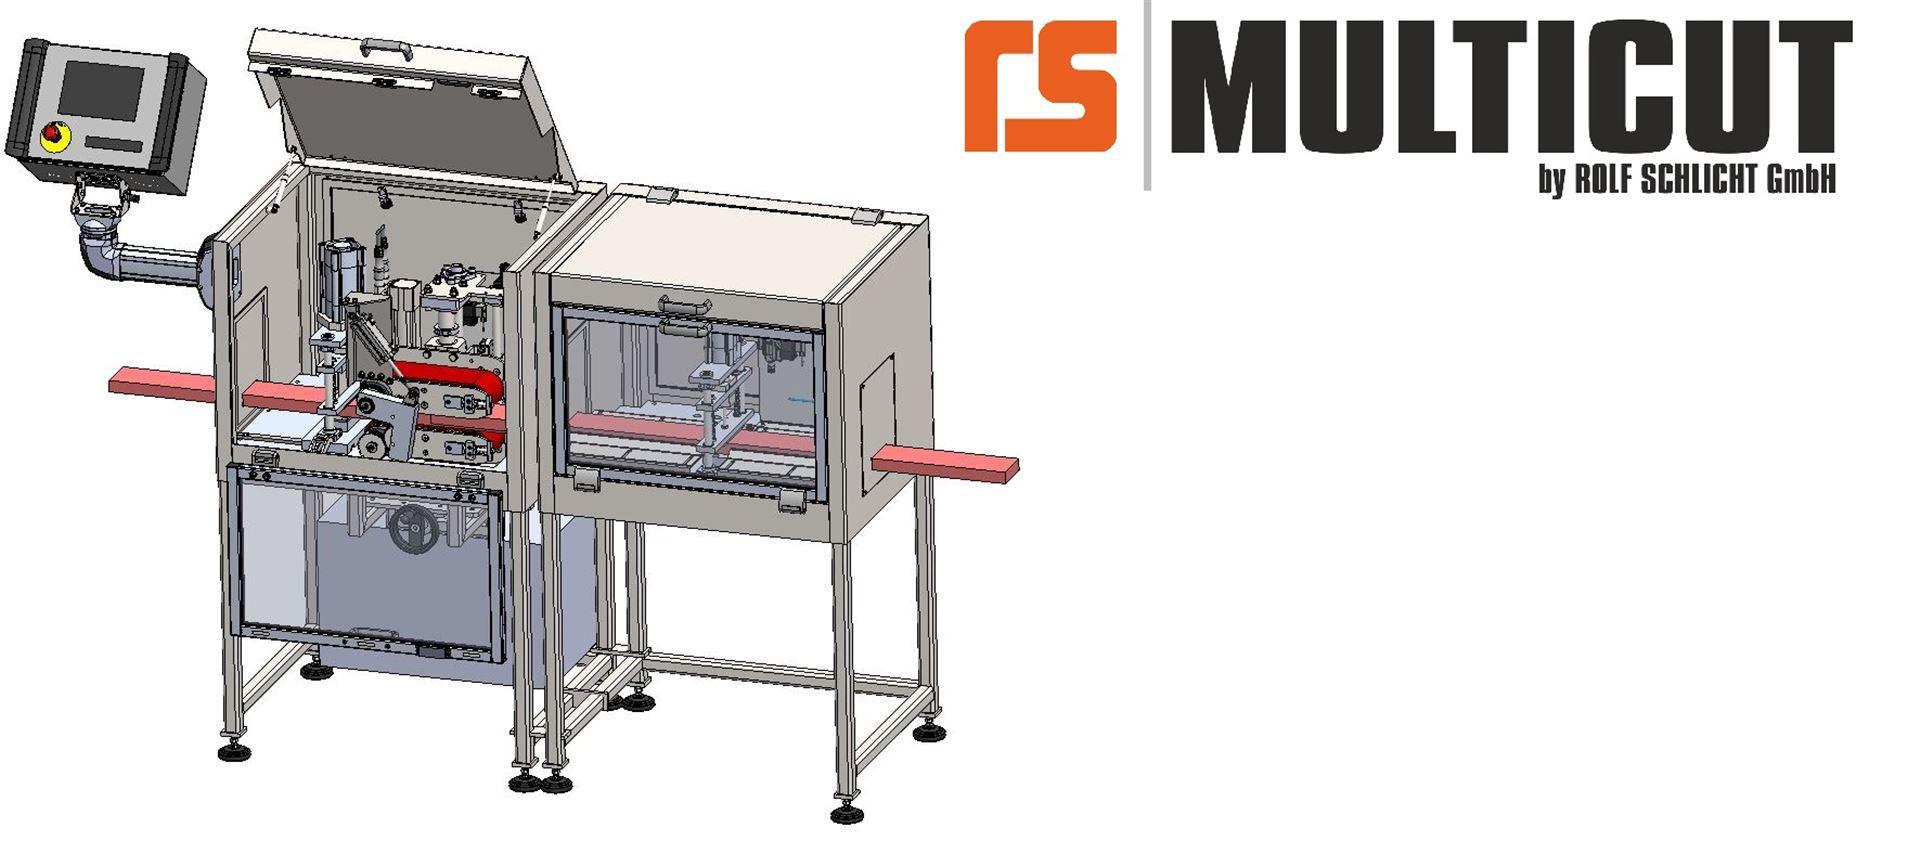 ROLF SCHLICHT GmbH - RS MULTICUT Schneidmaschinen - Typ MCS Modulares Schneidsystem